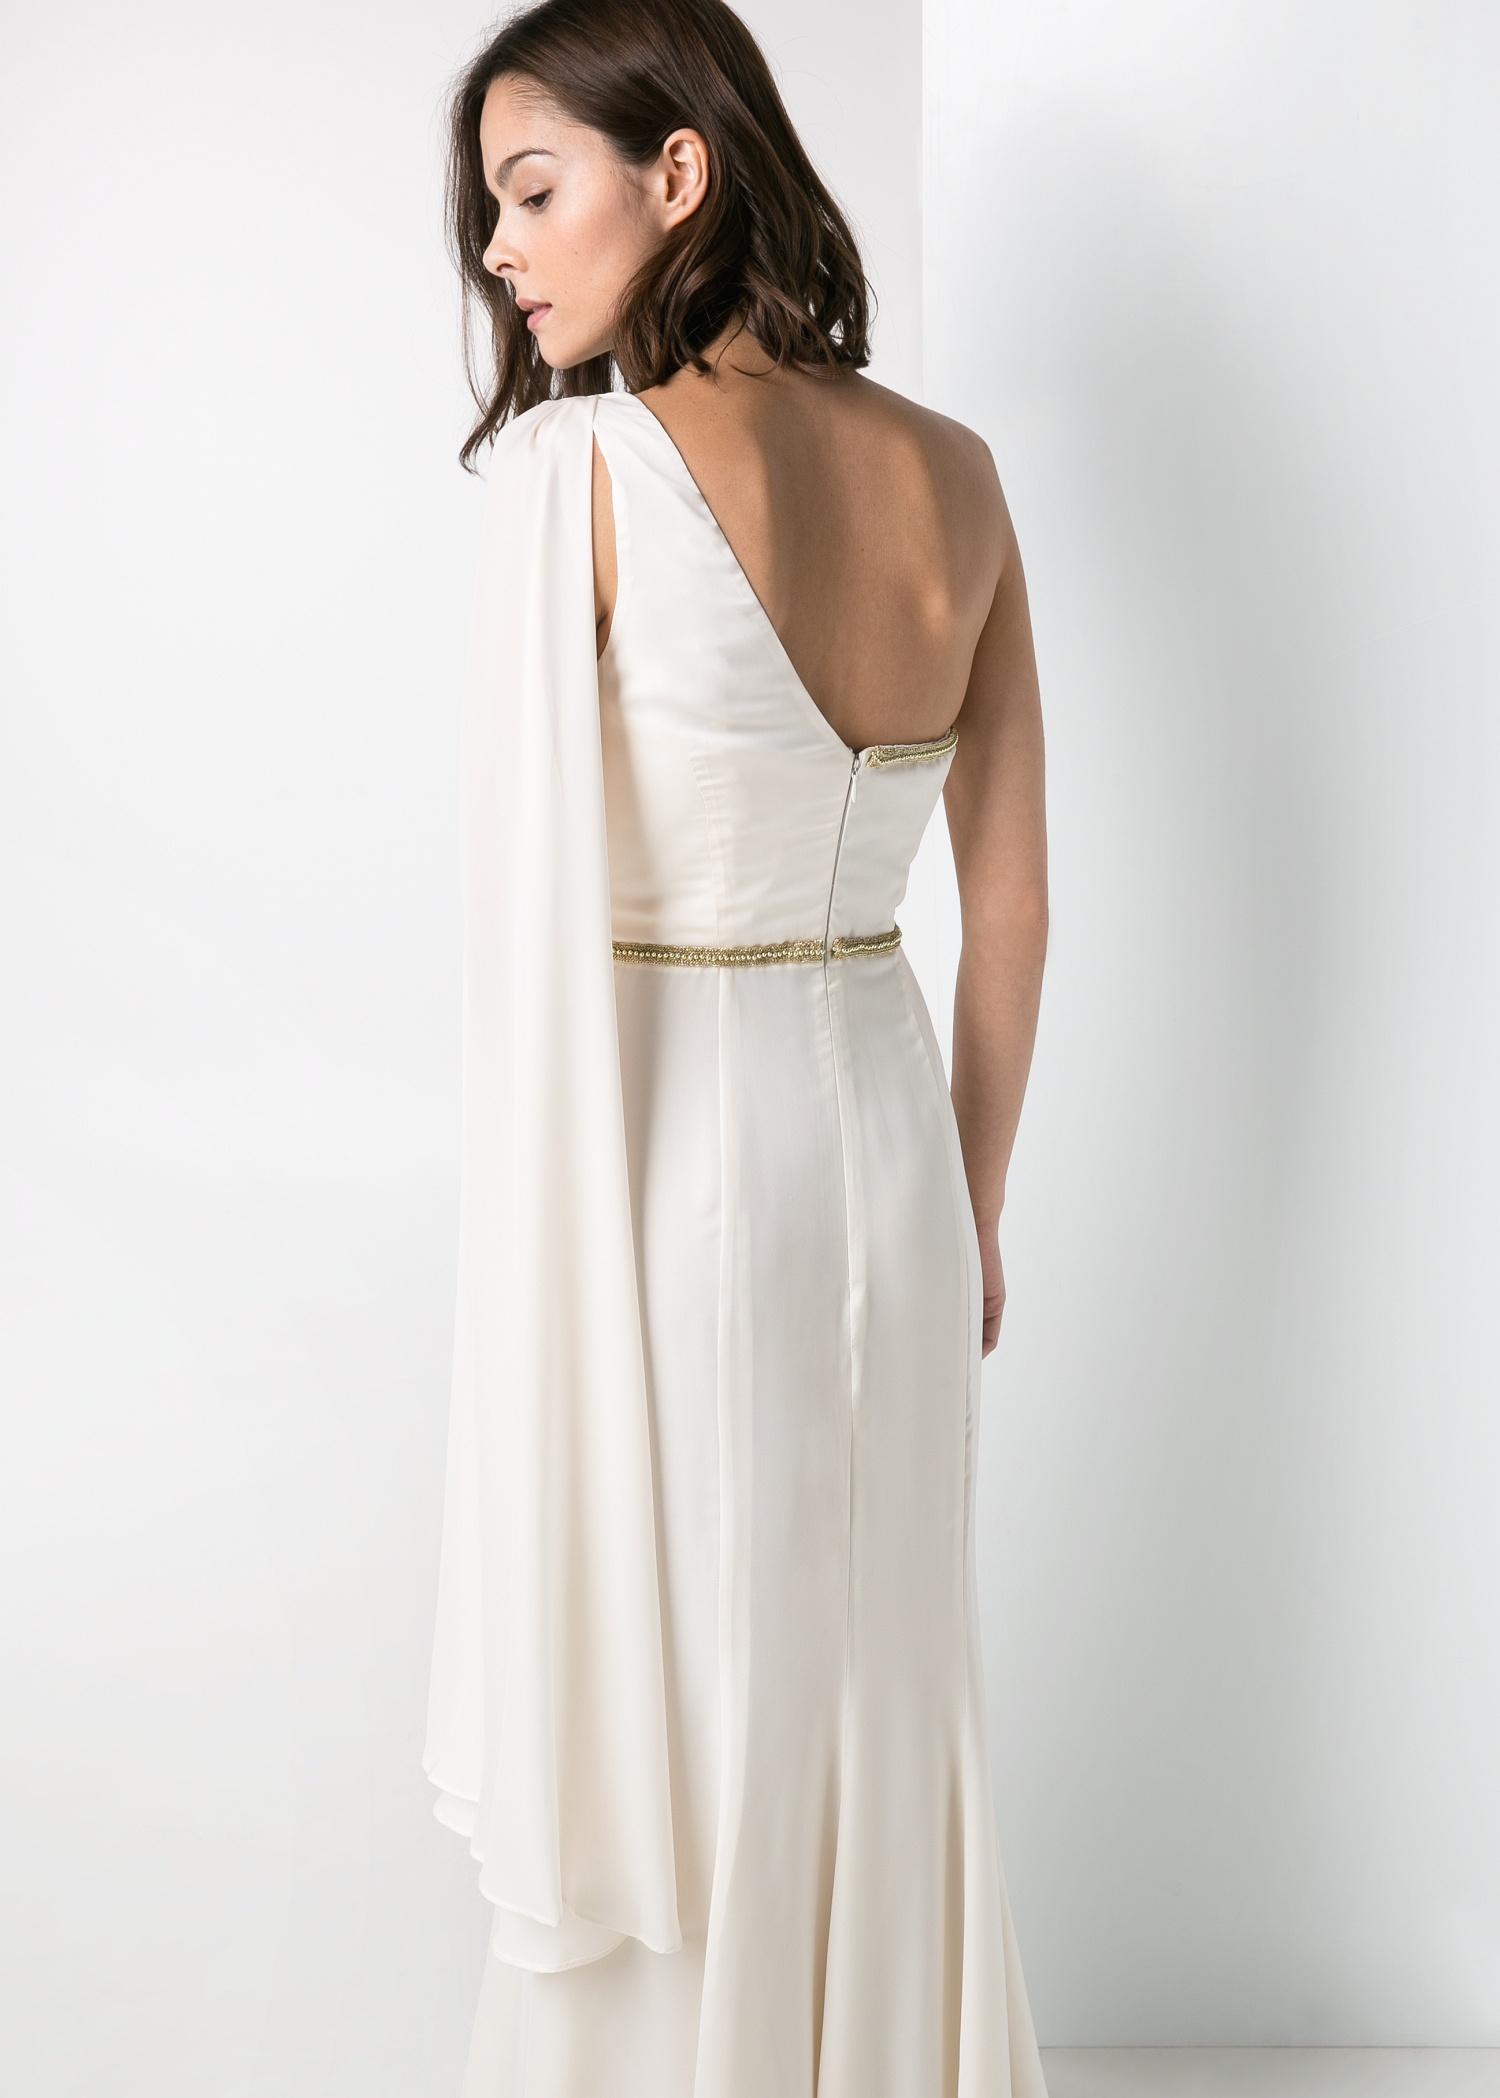 Lyst Mango Cascading Long Dress In White